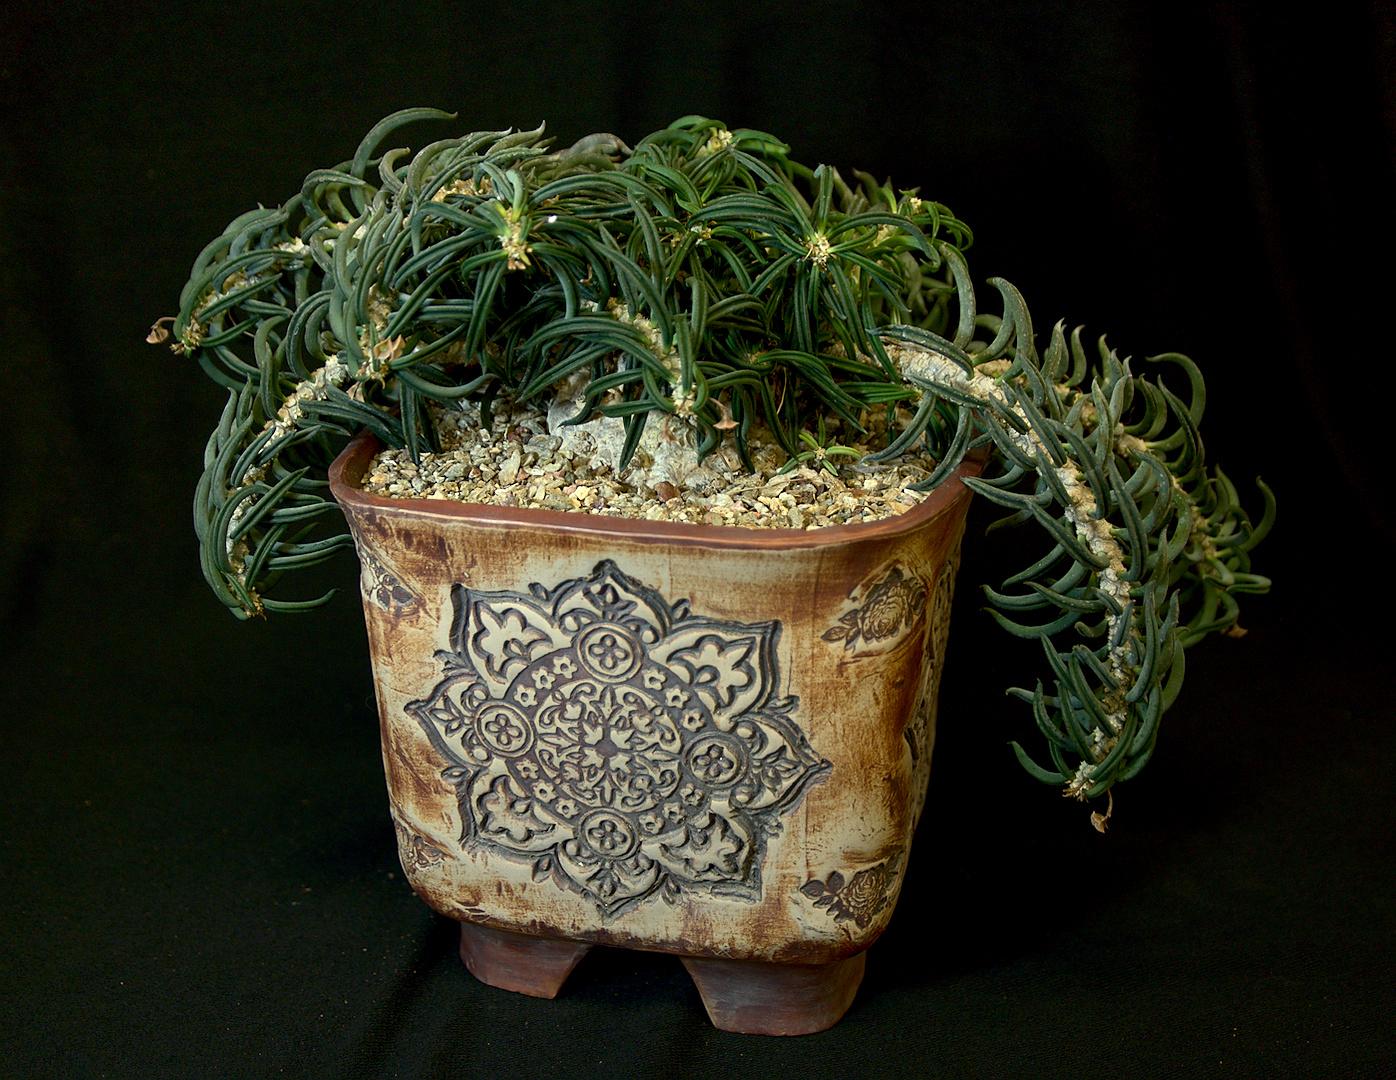 SCCSS 2019 February - Winner Open Succulent - Jim Hanna - Euphorbia cylindrifolia var. tubifera